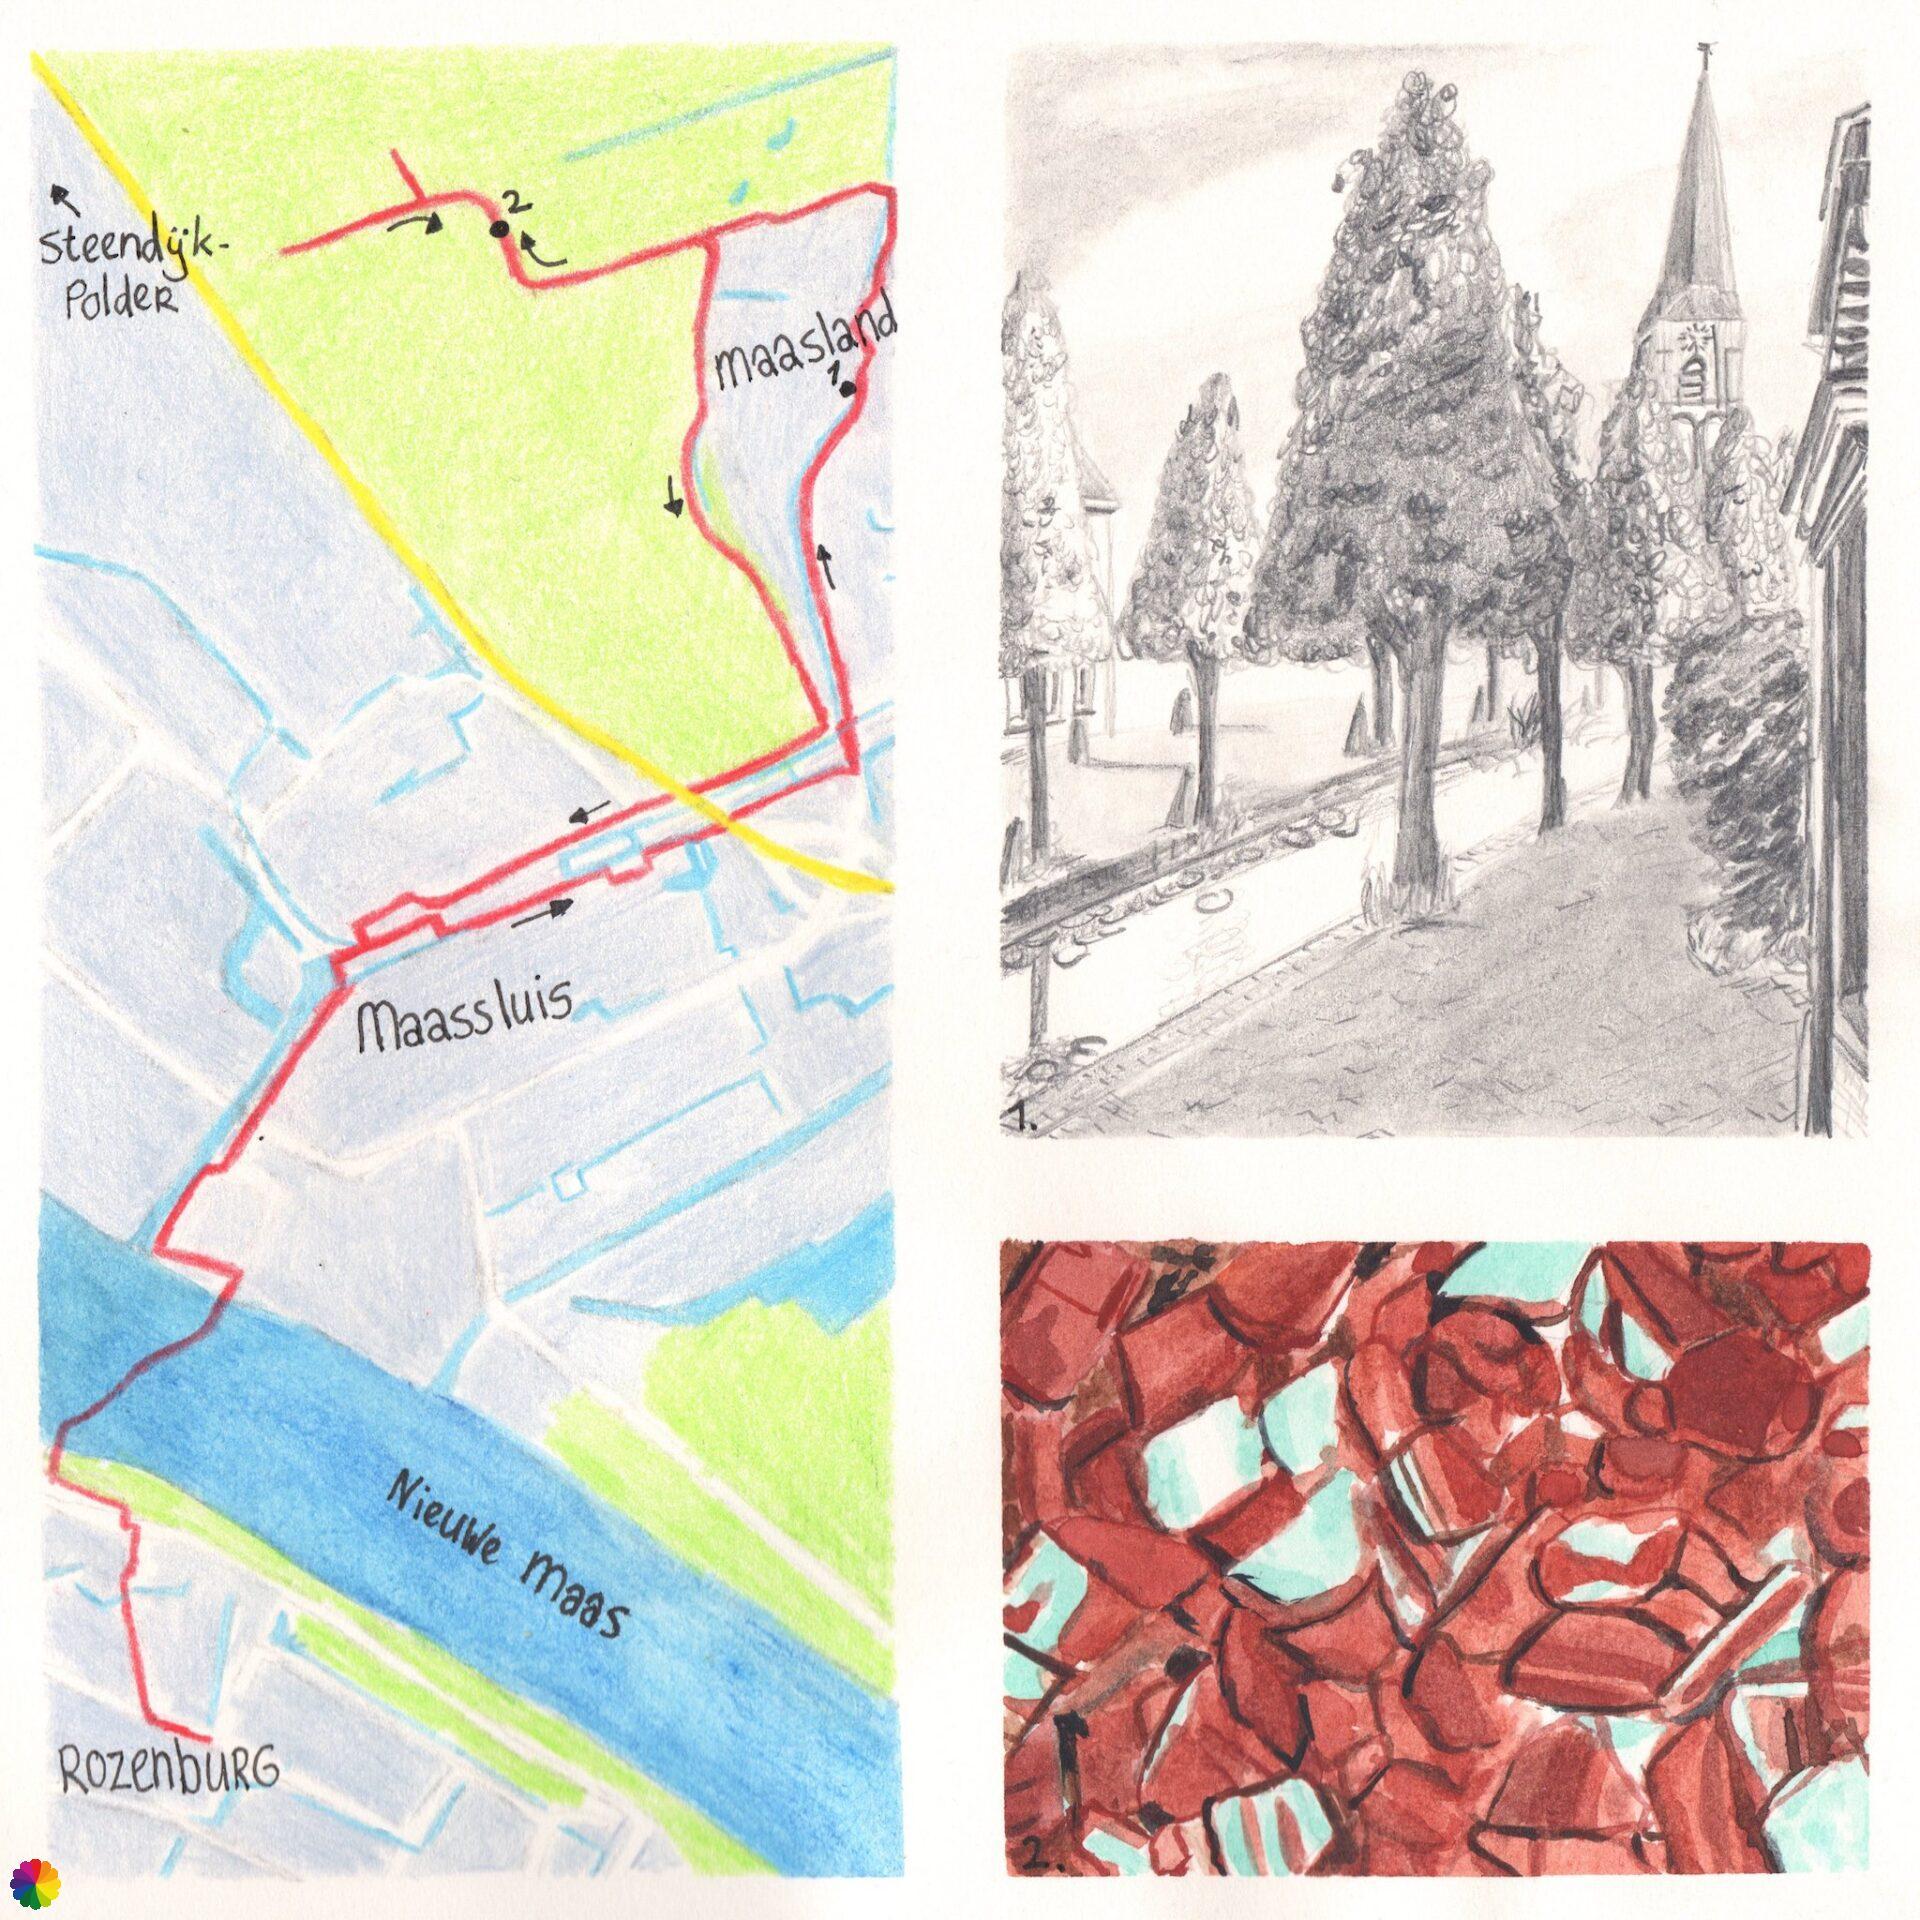 Wandelkaartje Rozenburg - Maassluis